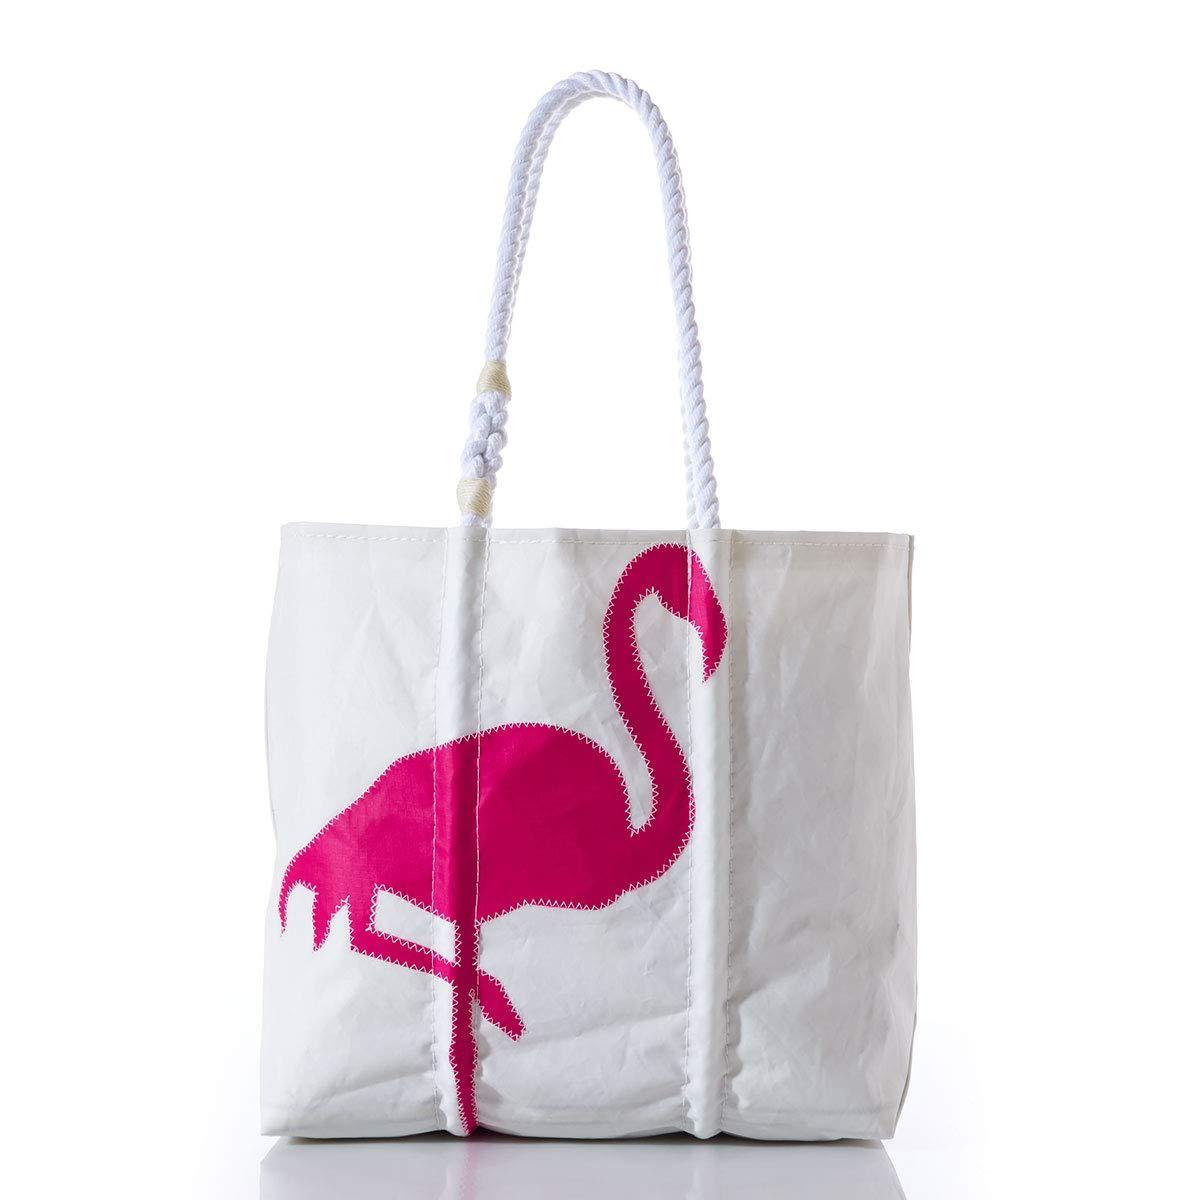 Sea Bags レディース カラー: ホワイト B076HGYKDS